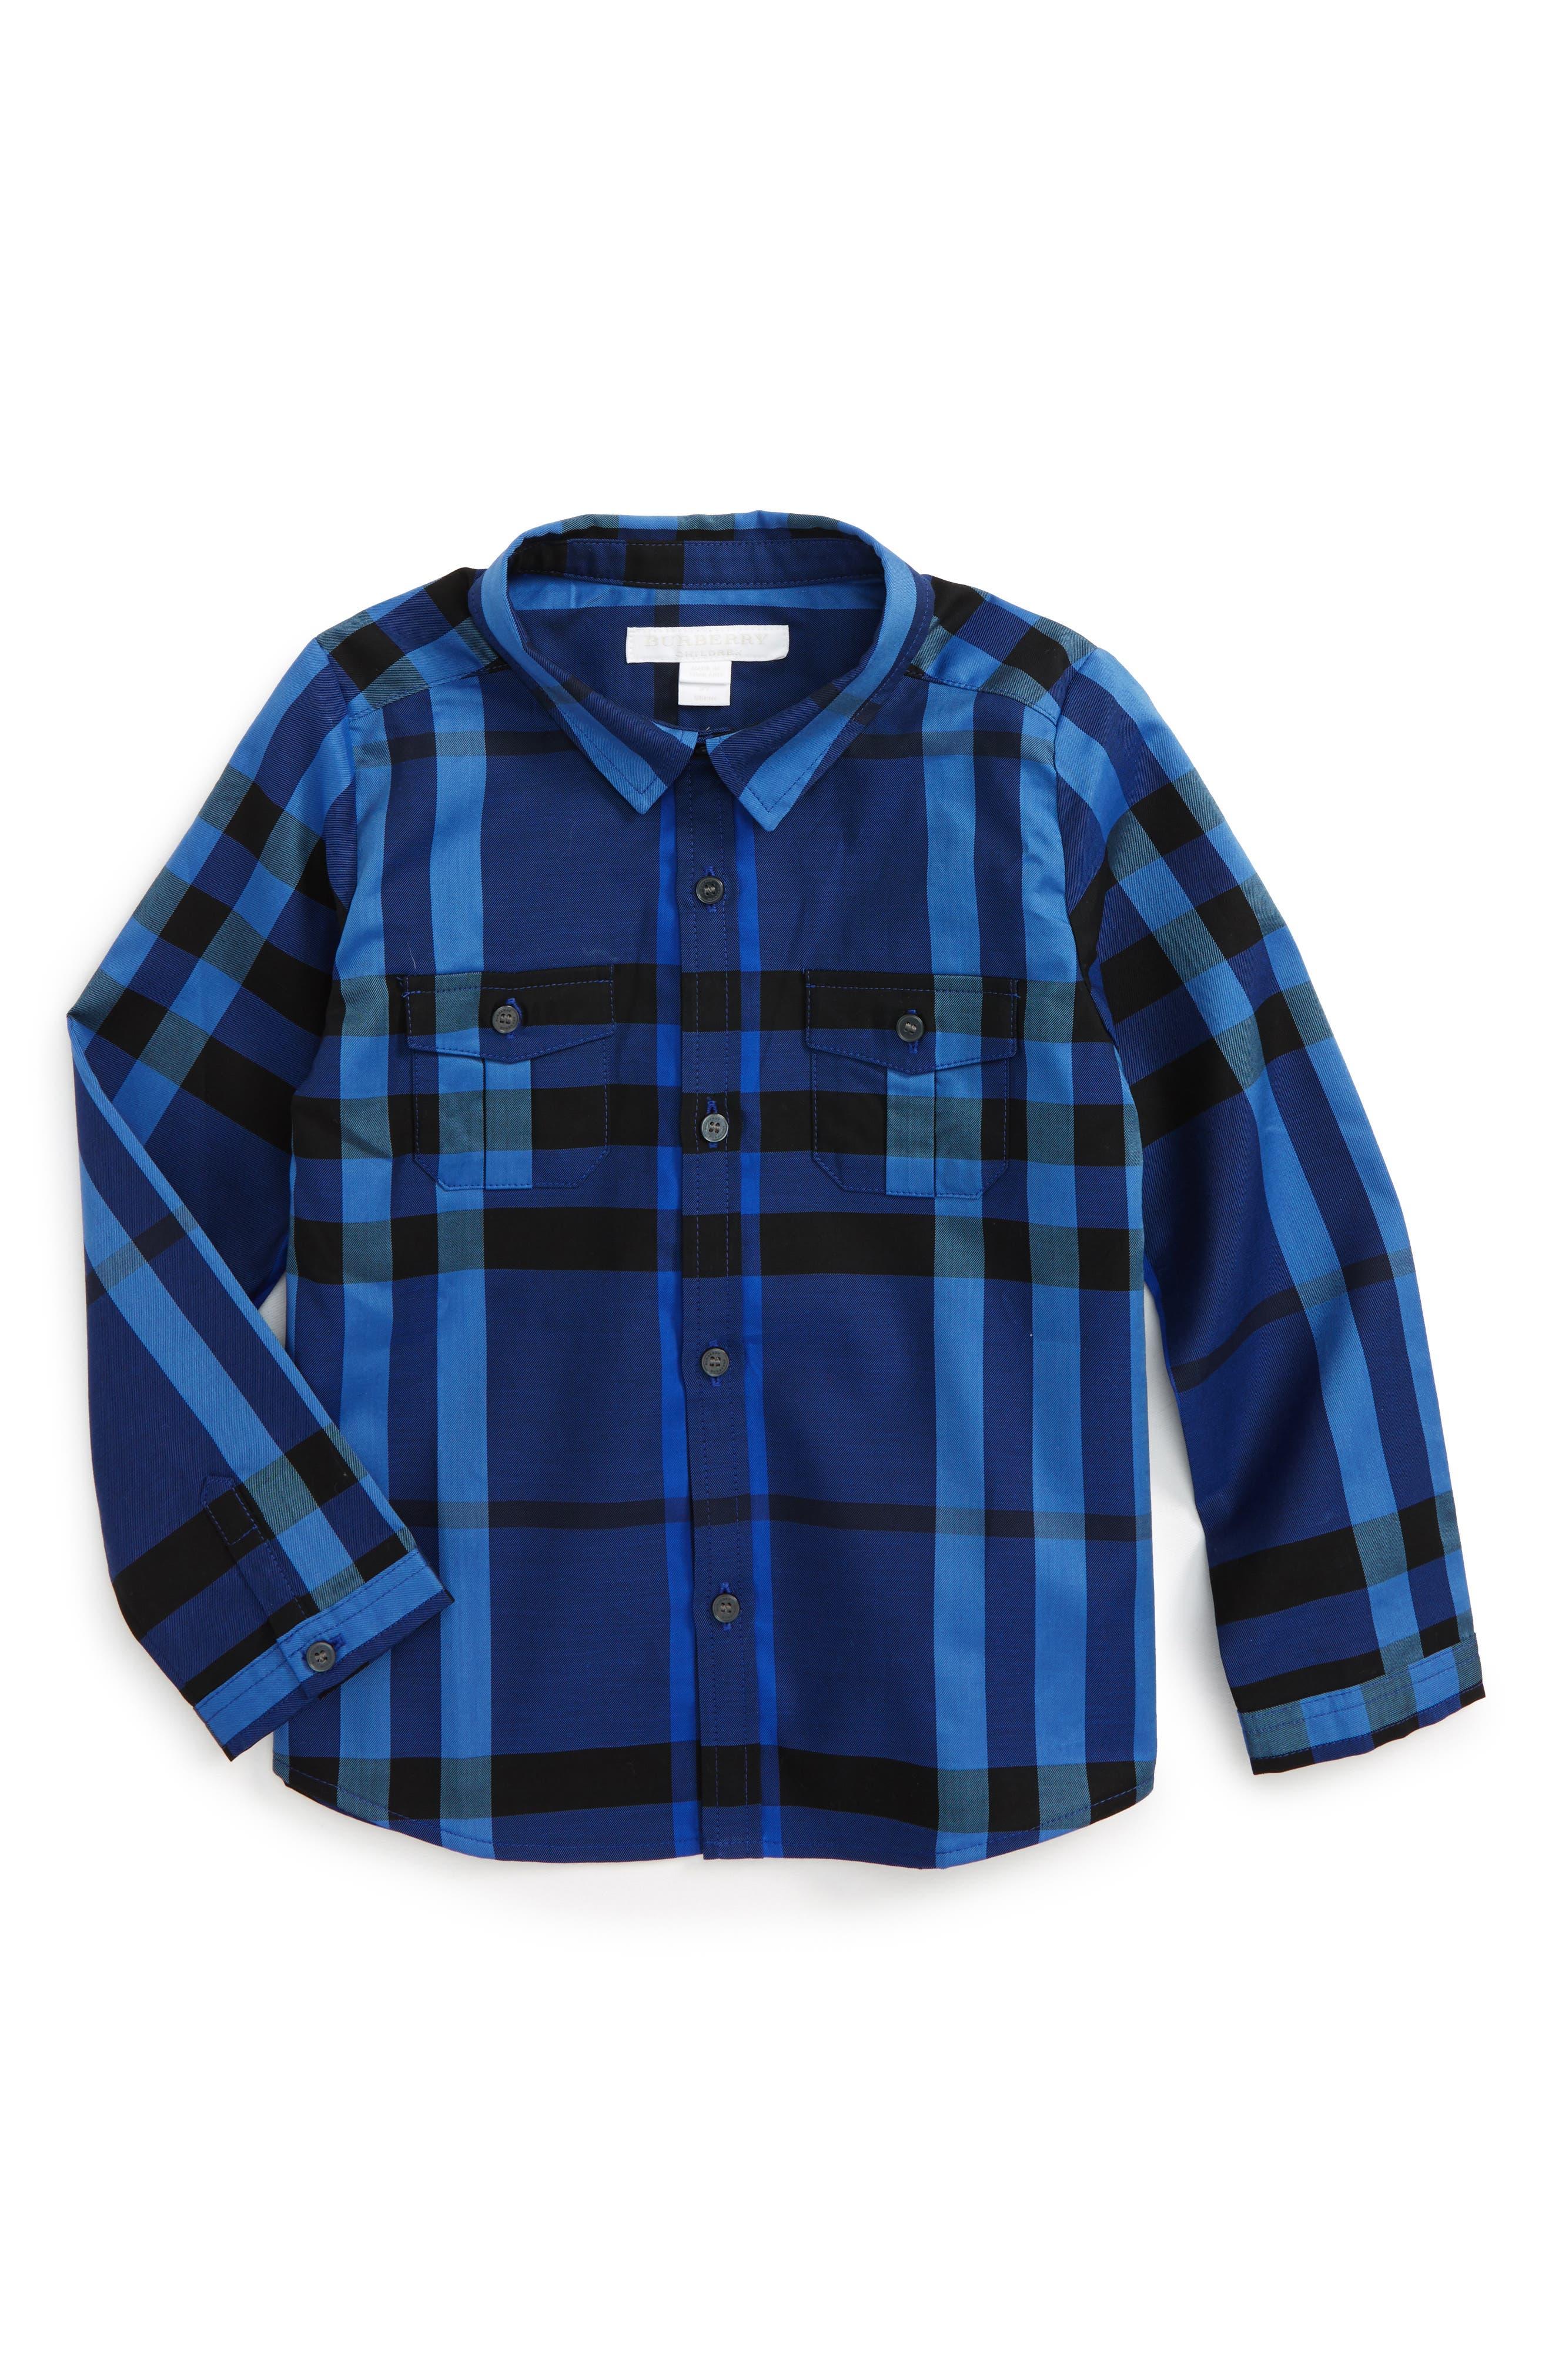 Alternate Image 1 Selected - Burberry Trenta Plaid Woven Shirt (Baby Boys)